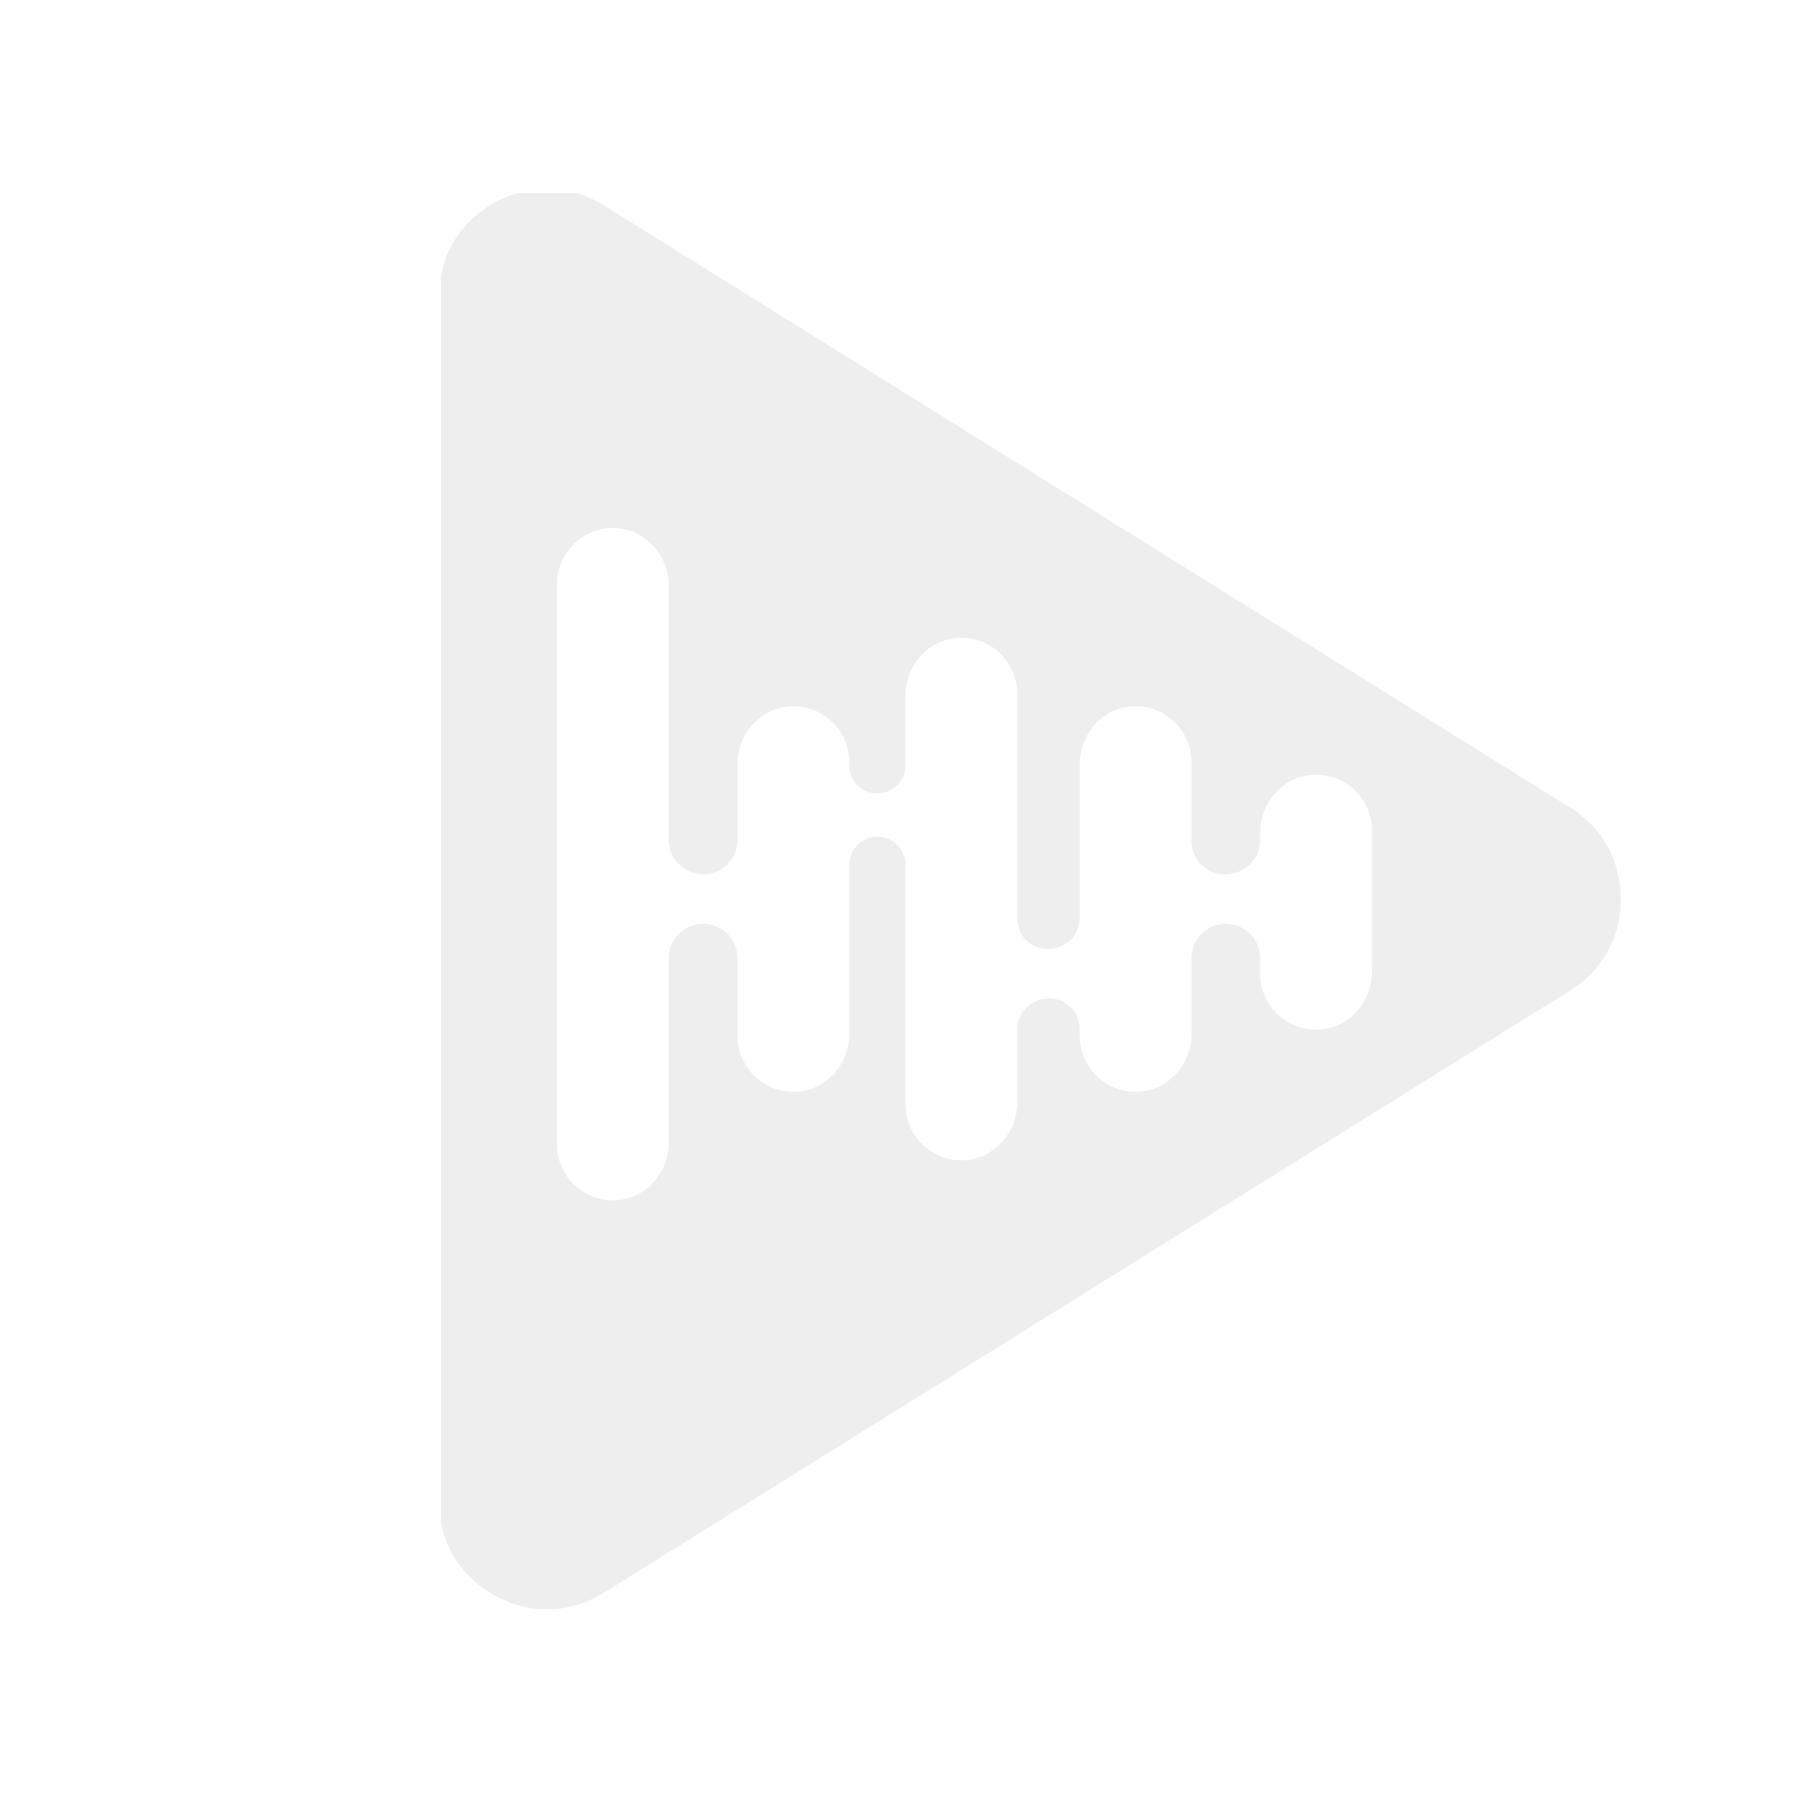 Audison AP F8.9 BIT-AUDI2